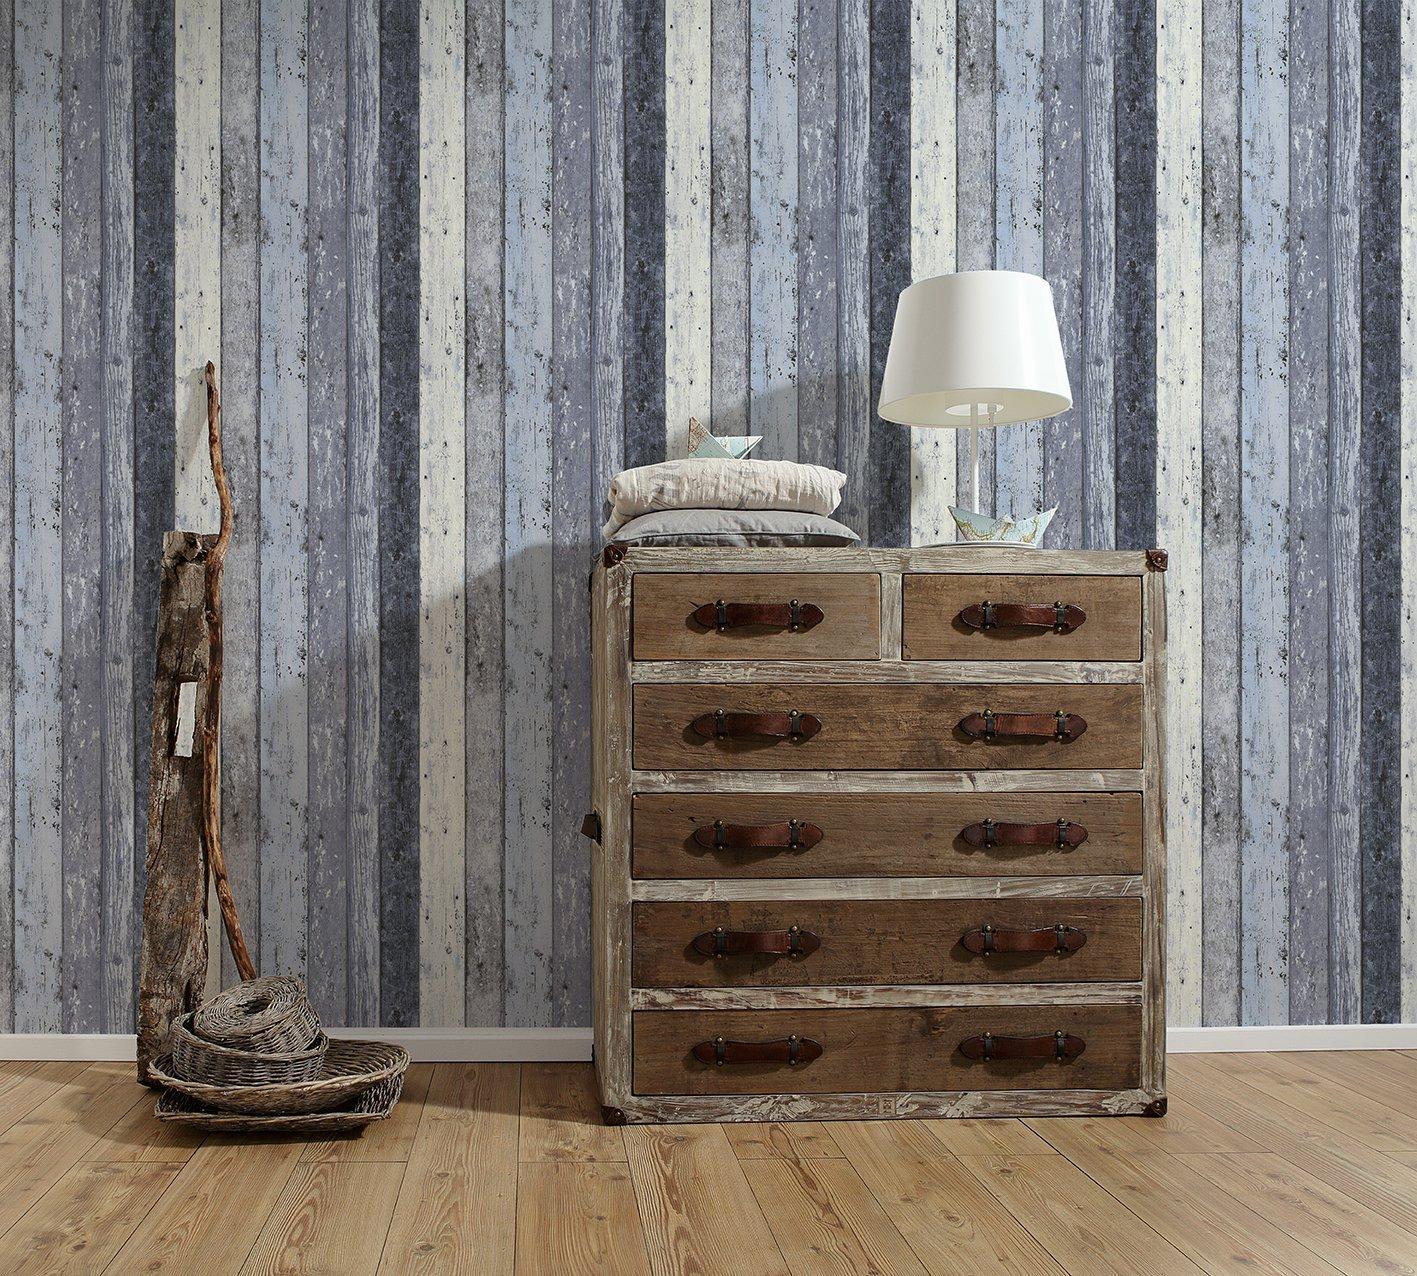 maritime deko f rs wohnzimmer maritime. Black Bedroom Furniture Sets. Home Design Ideas